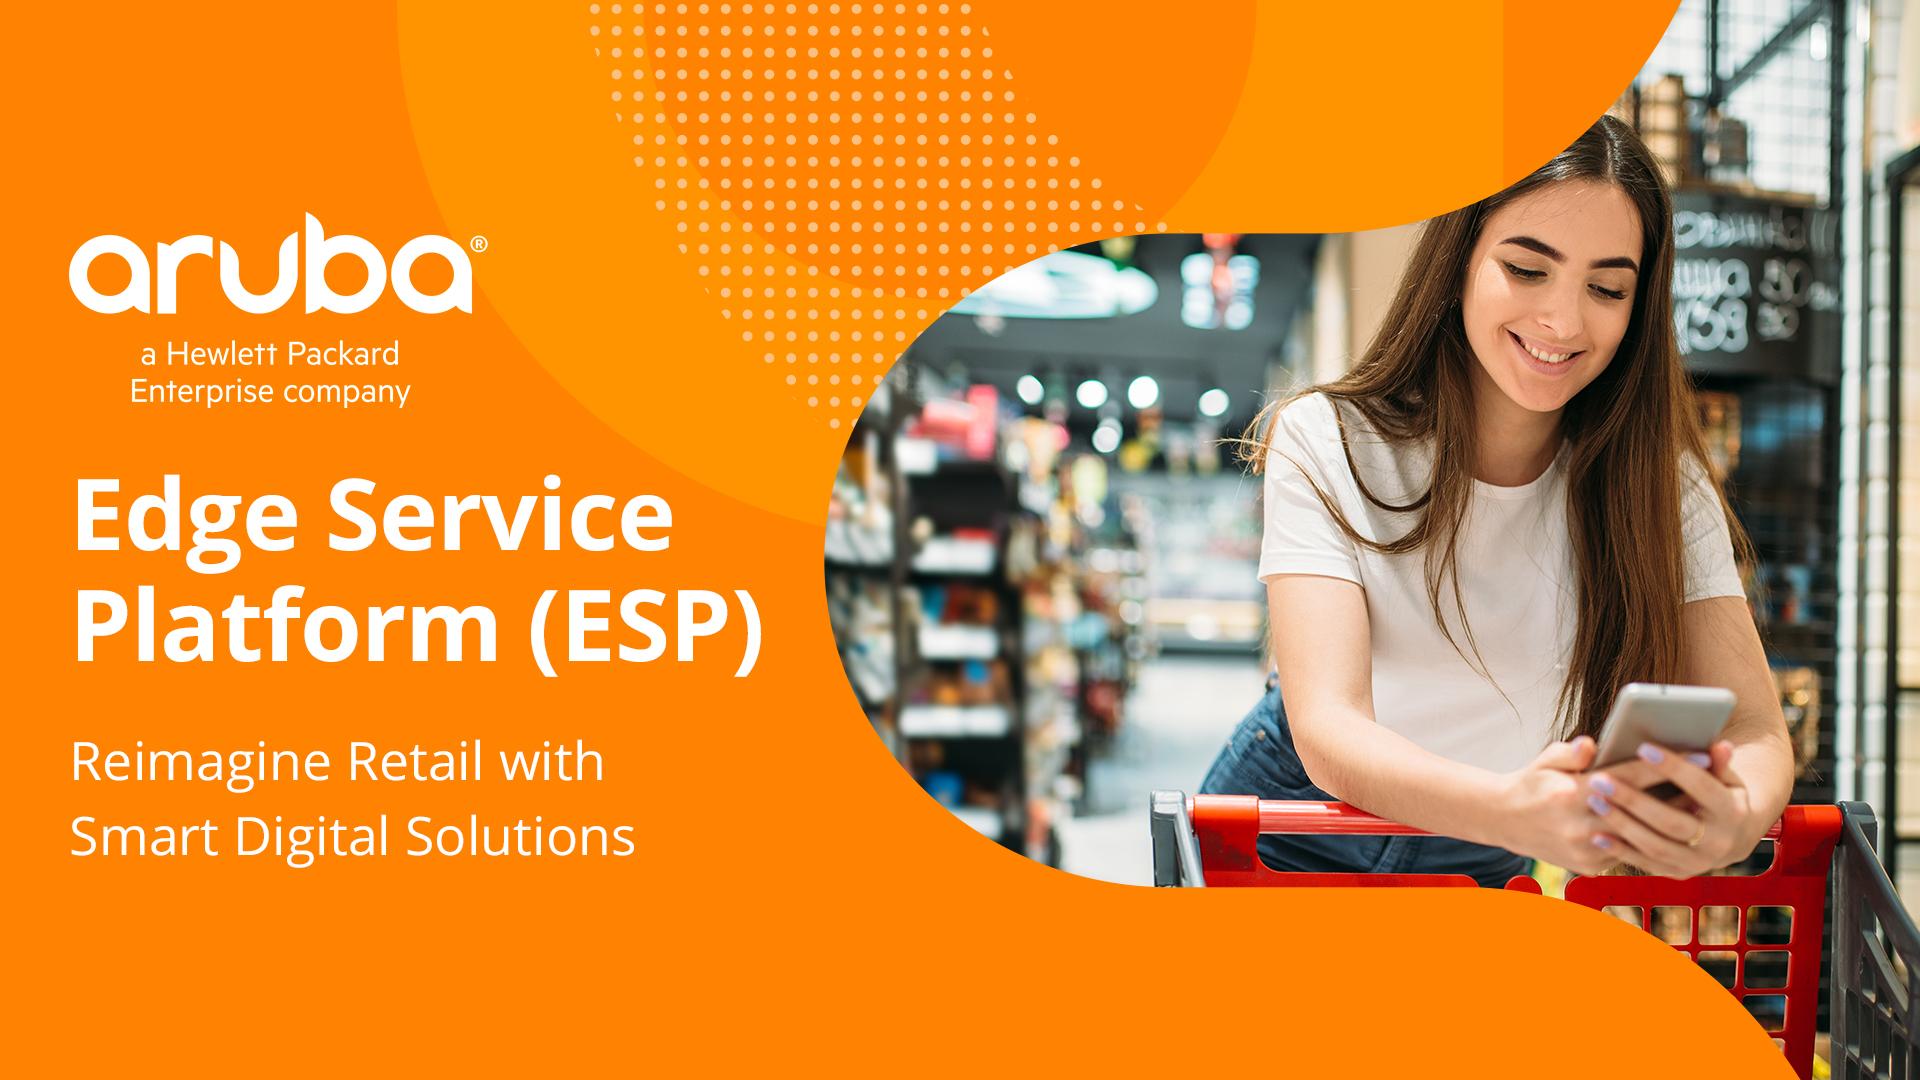 Aruba Edge Service Platform in Retail